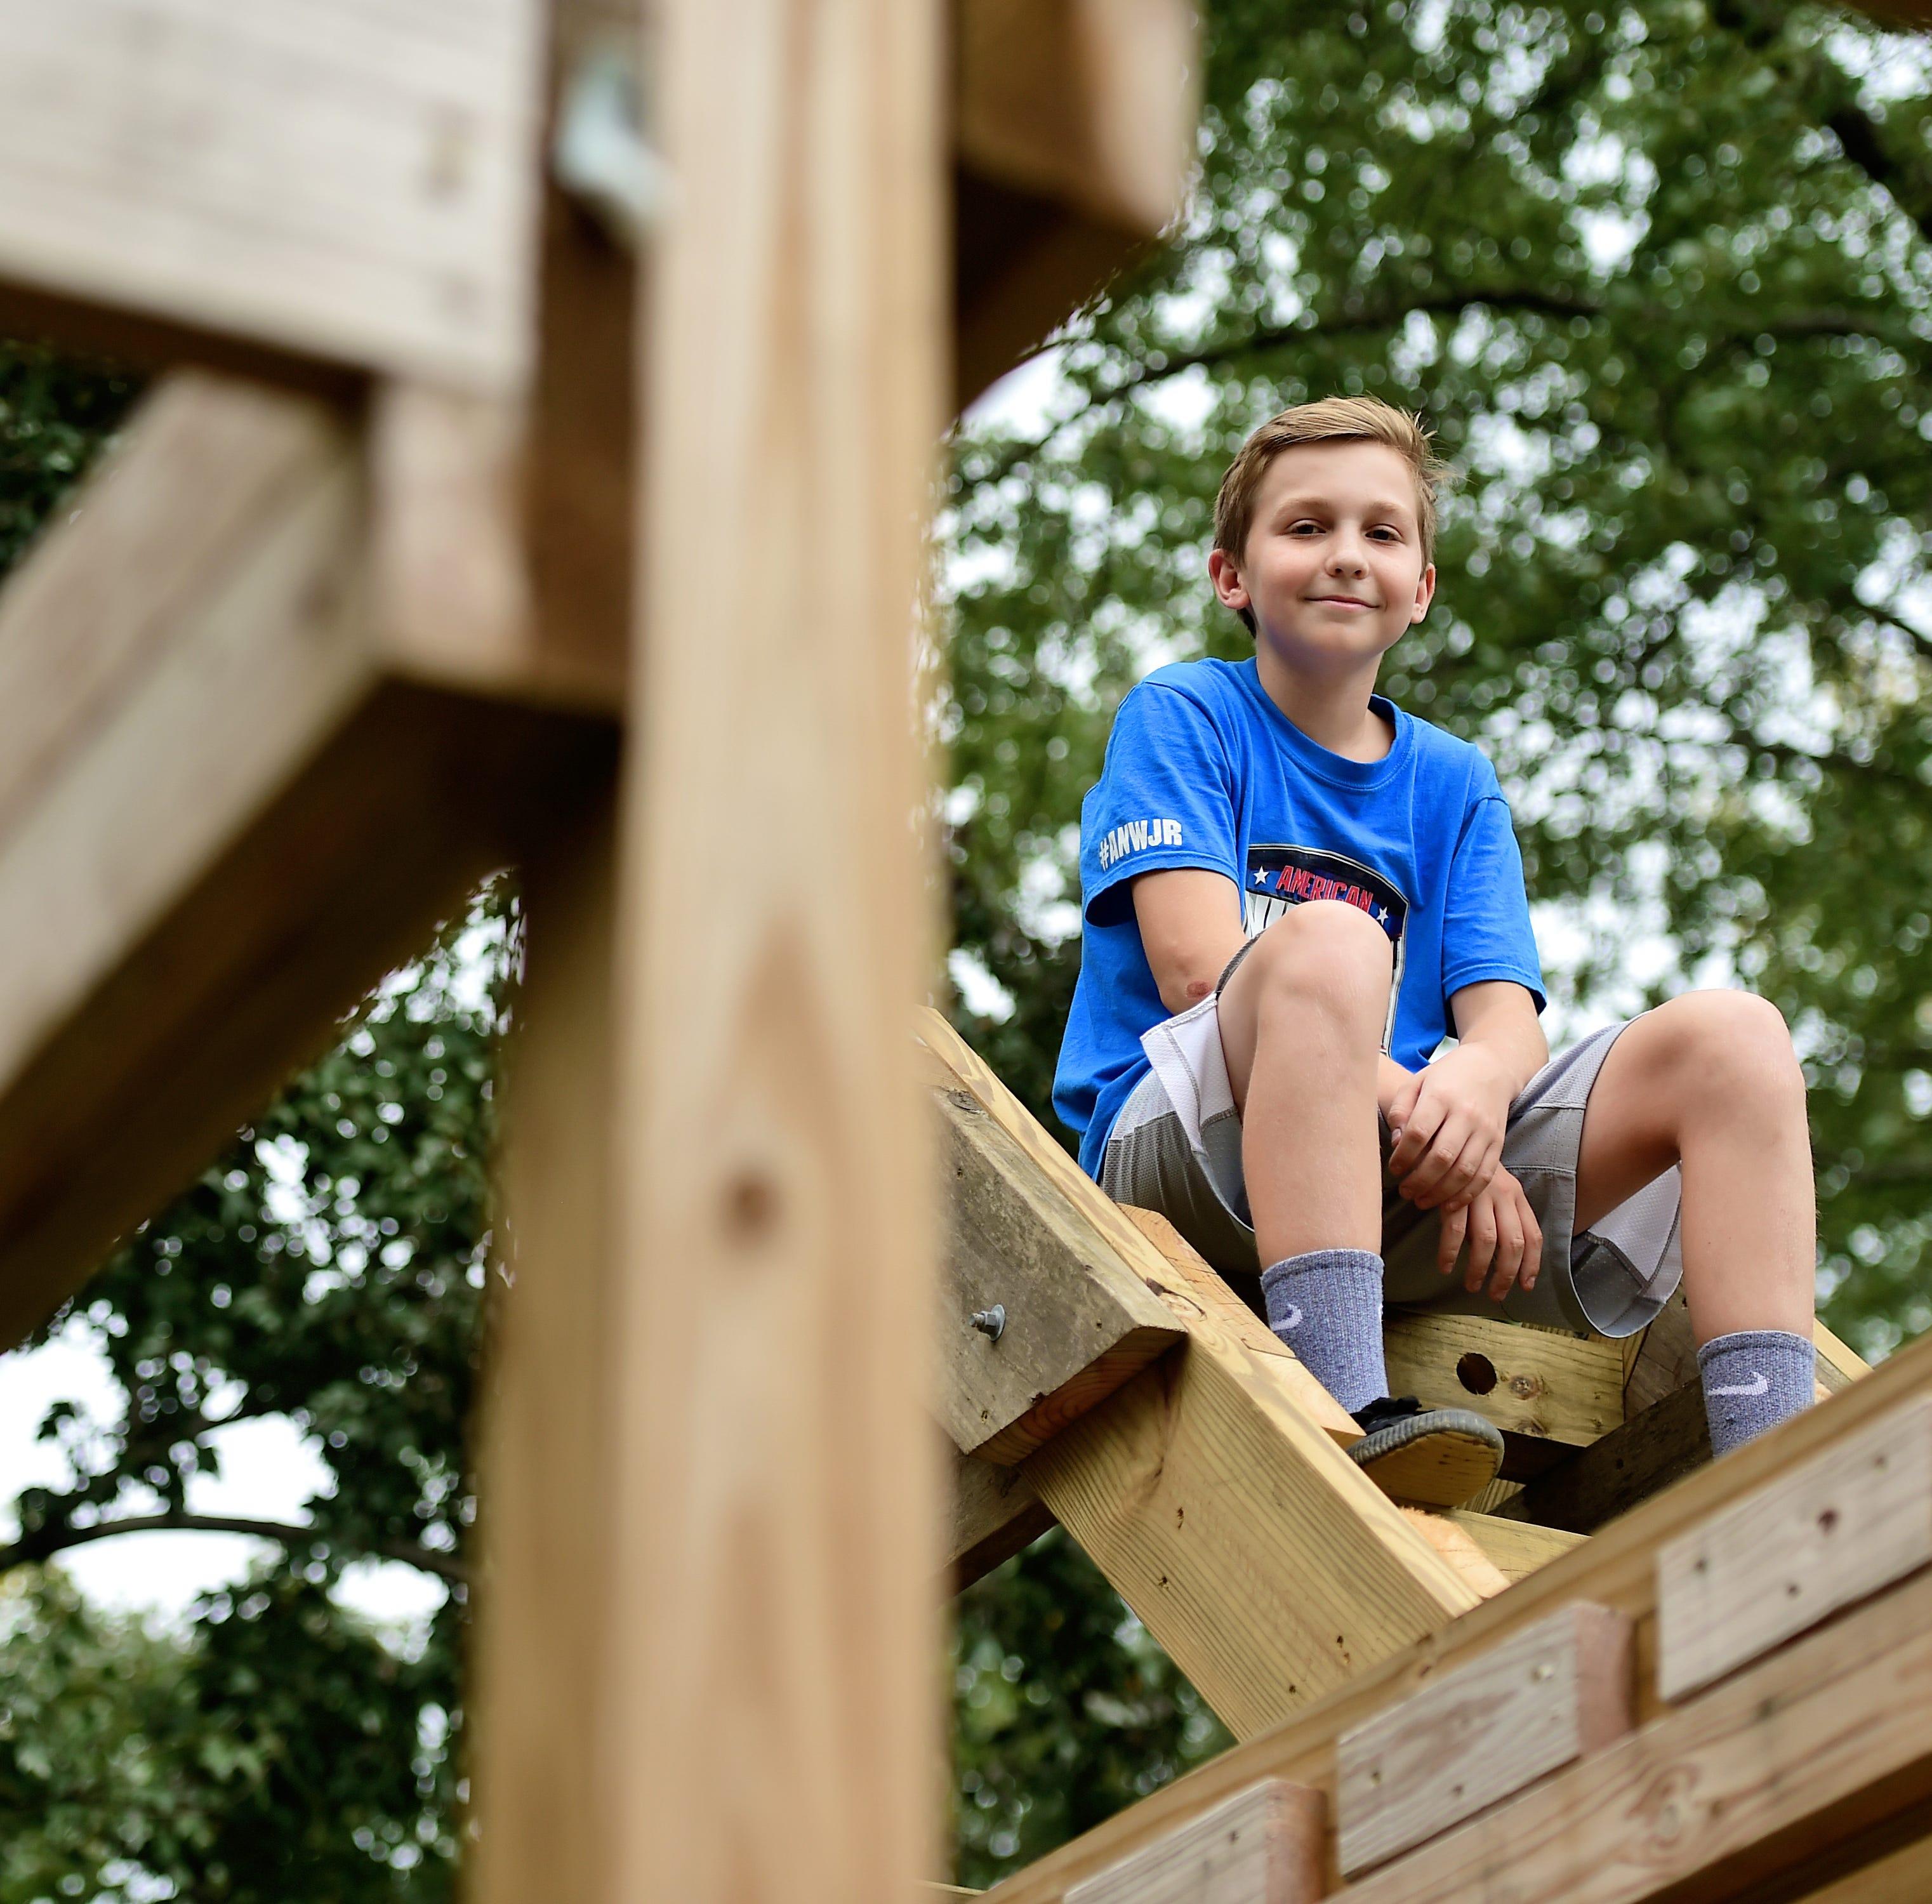 American Ninja Warrior Junior contestant trains at Vestal home gym dad built